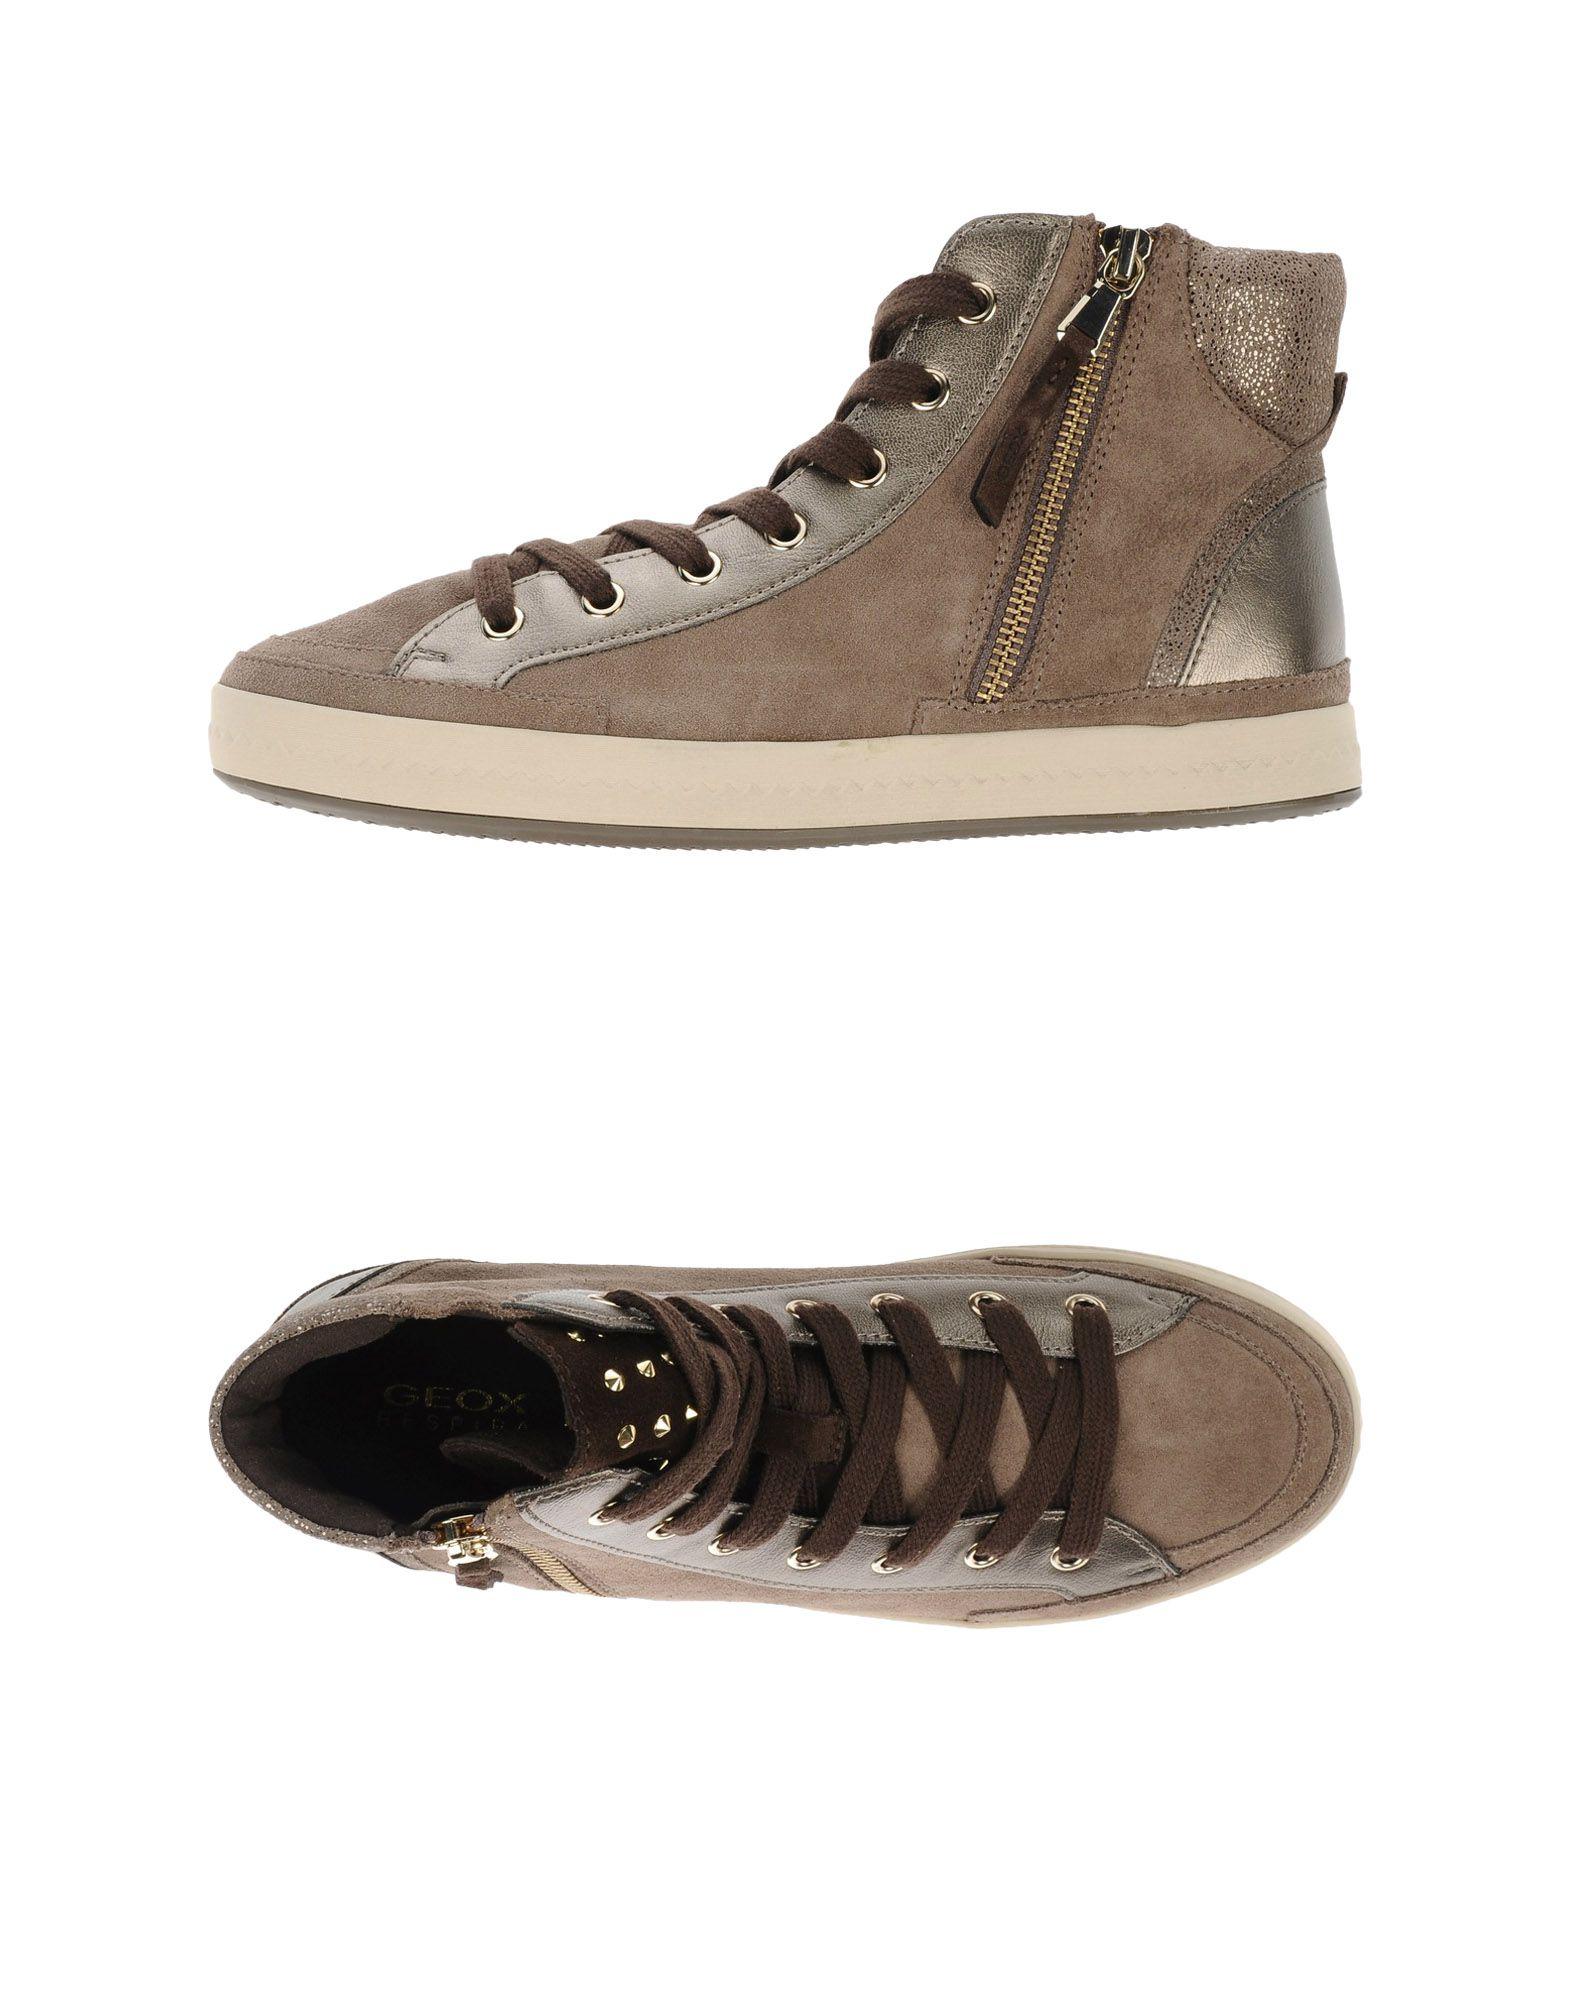 Geox Sneakers Damen beliebte  44914499NM Gute Qualität beliebte Damen Schuhe 314f73